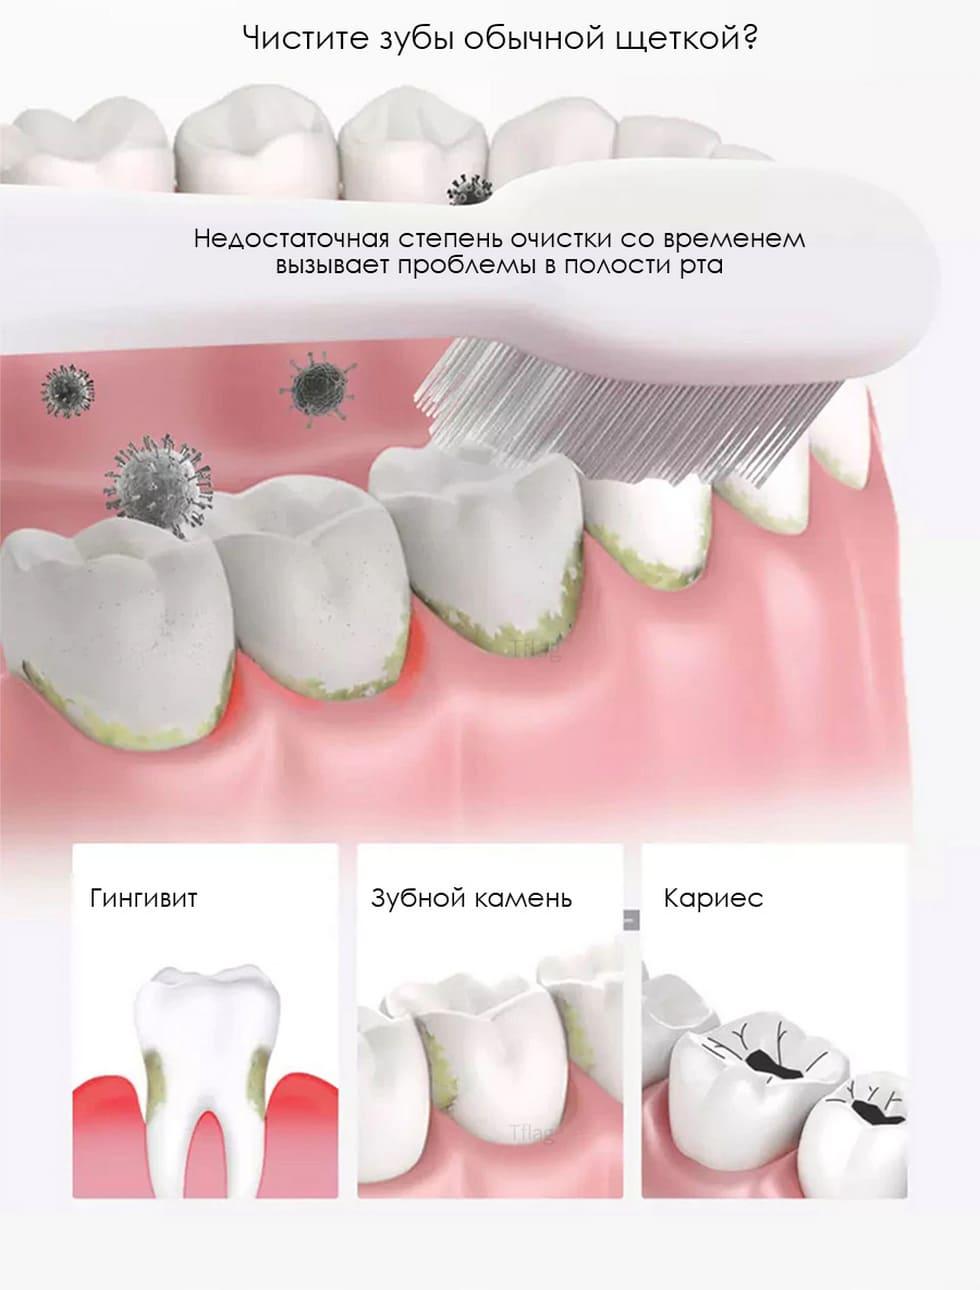 Беспроводной ирригатор Xiaomi Zhibai Wireless Tooth Cleaning XL1 (белый) robot4home.ru